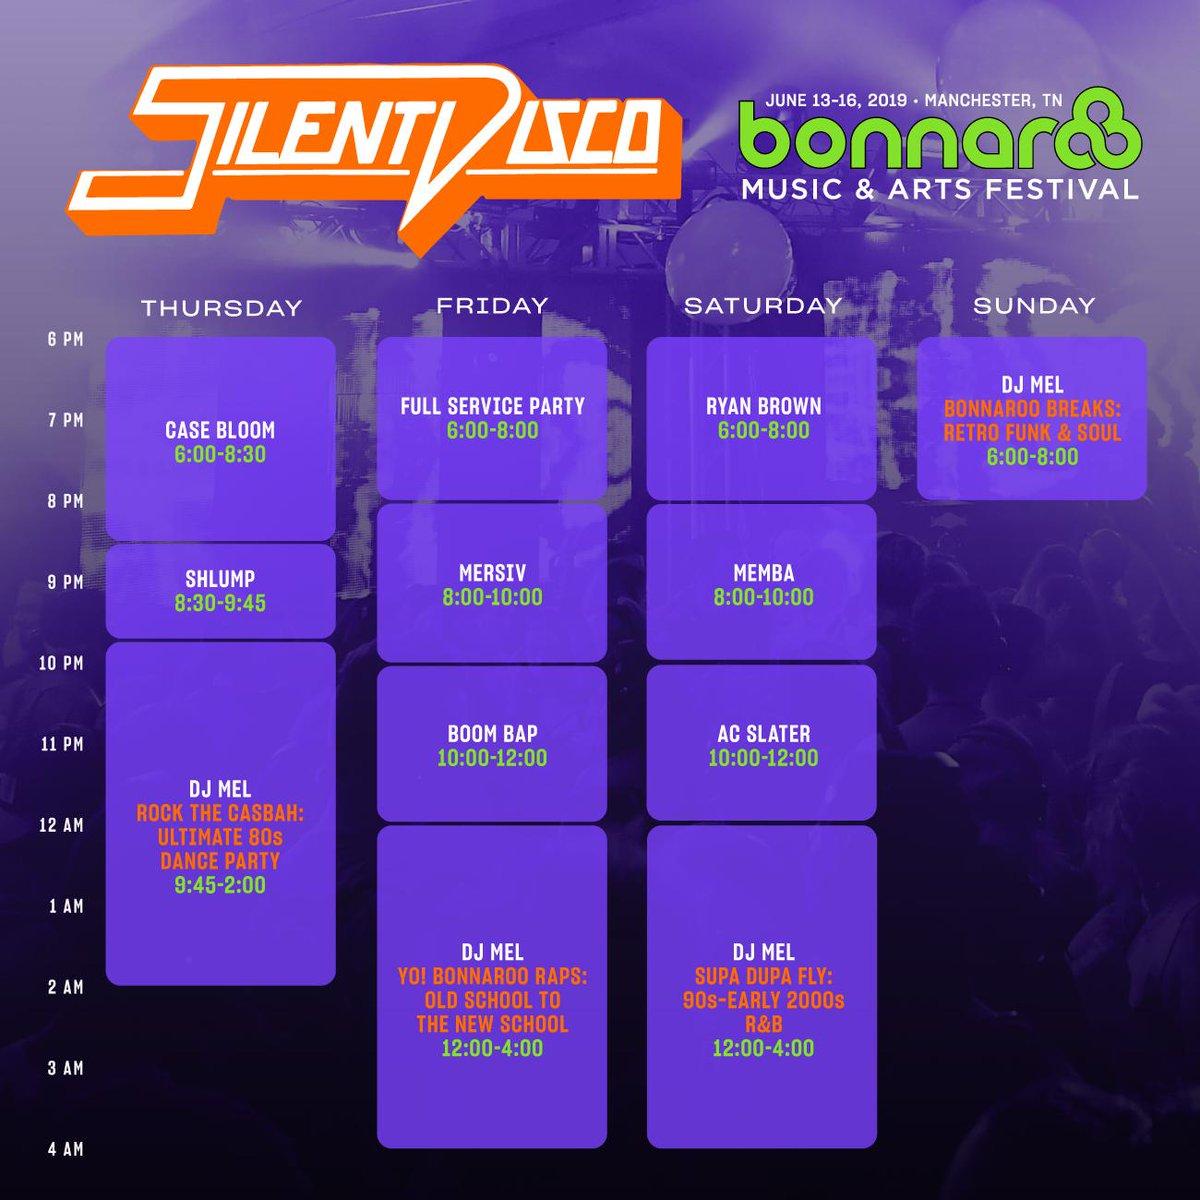 Bonnaroo Silent Disco lineup 2019